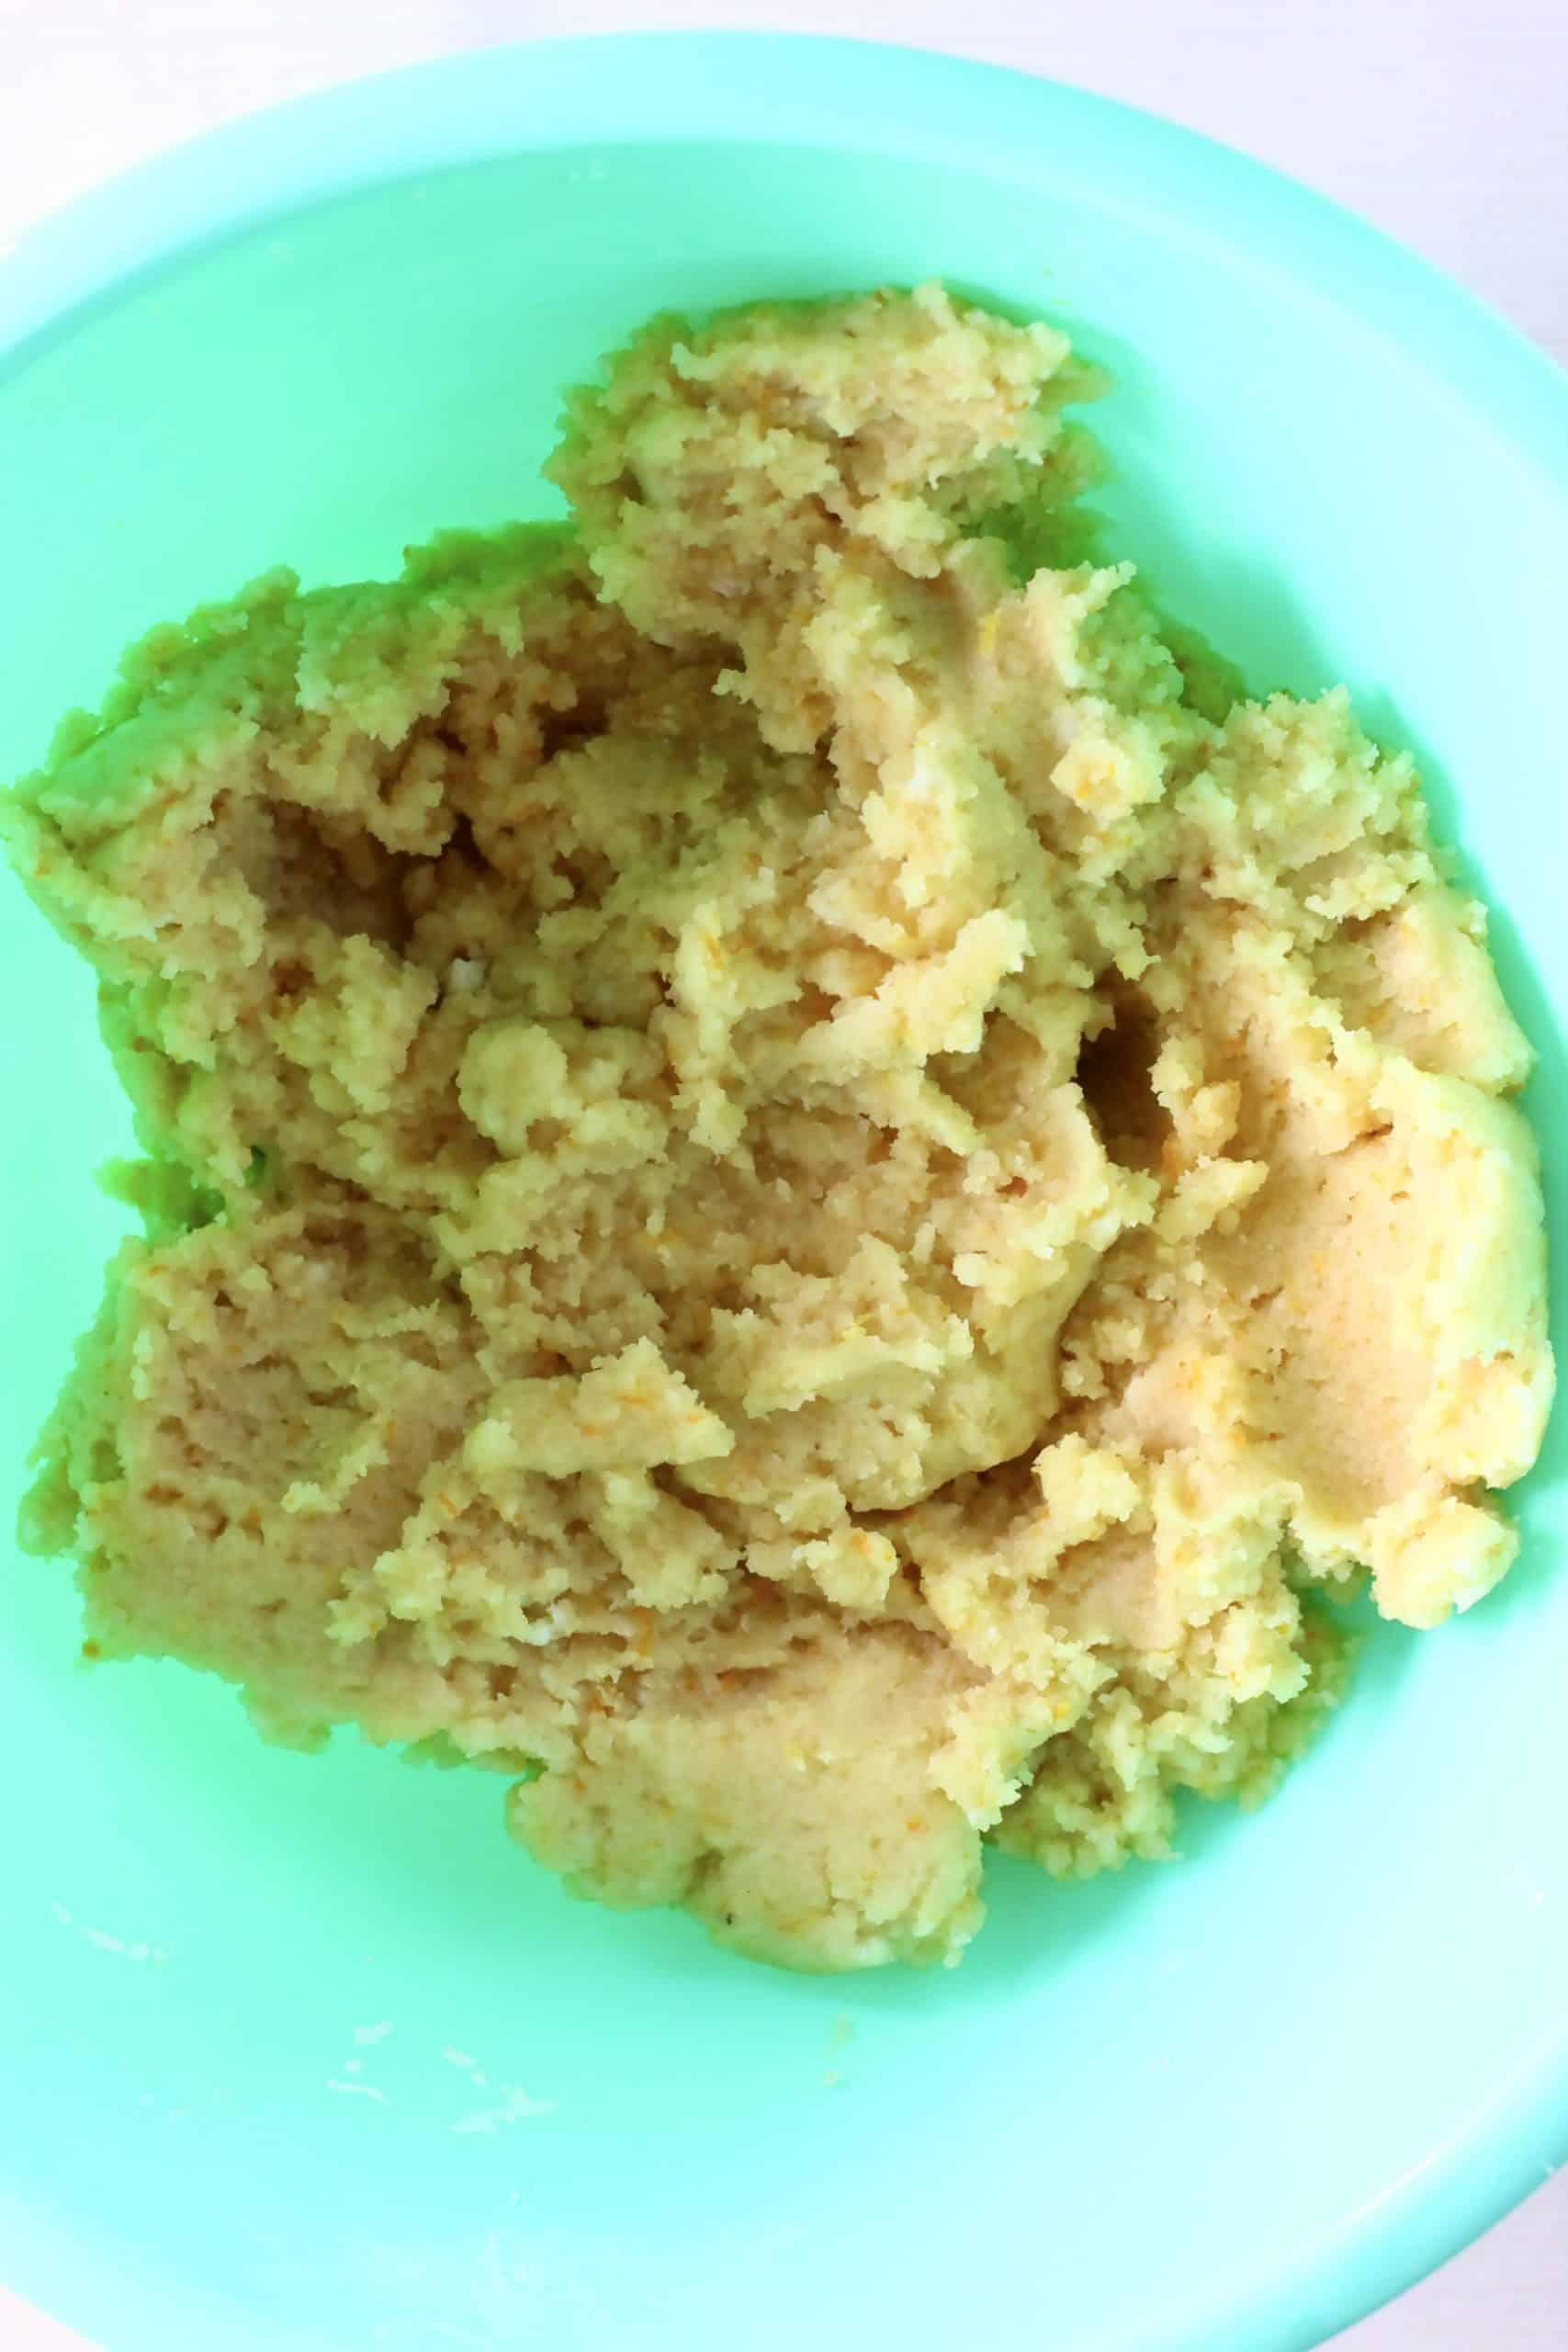 Raw gluten-free vegan orange cookie dough in a mixing bowl